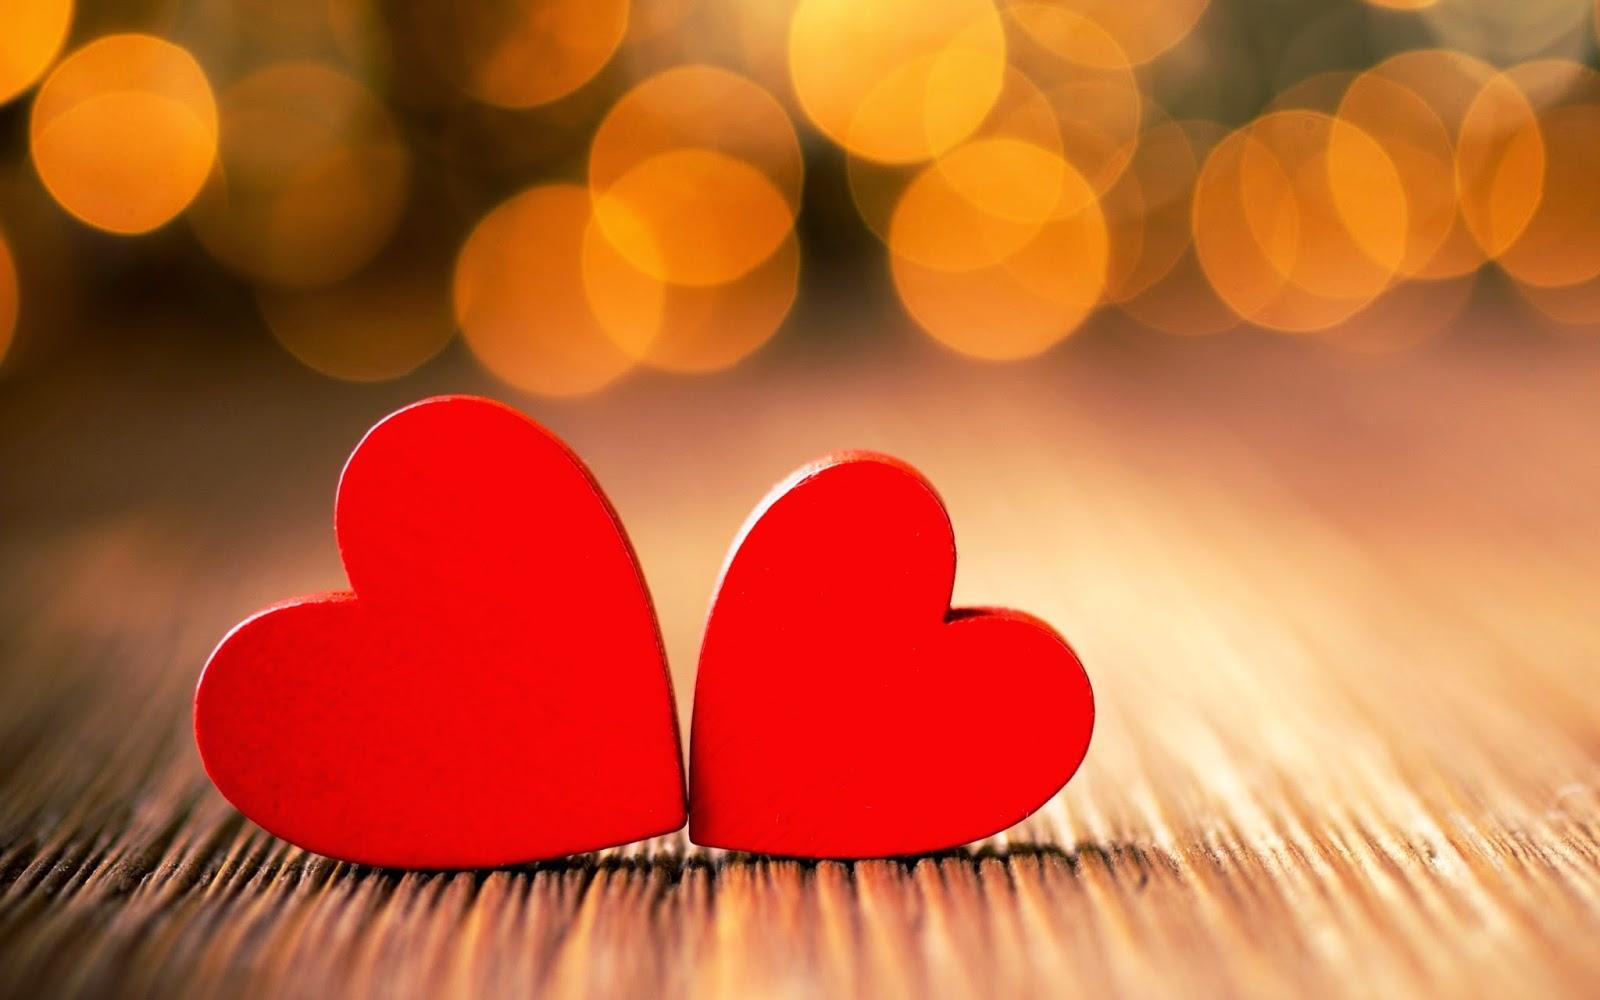 20 Beautiful Free Valentine's Day Wallpapers 2018 - WPSnow